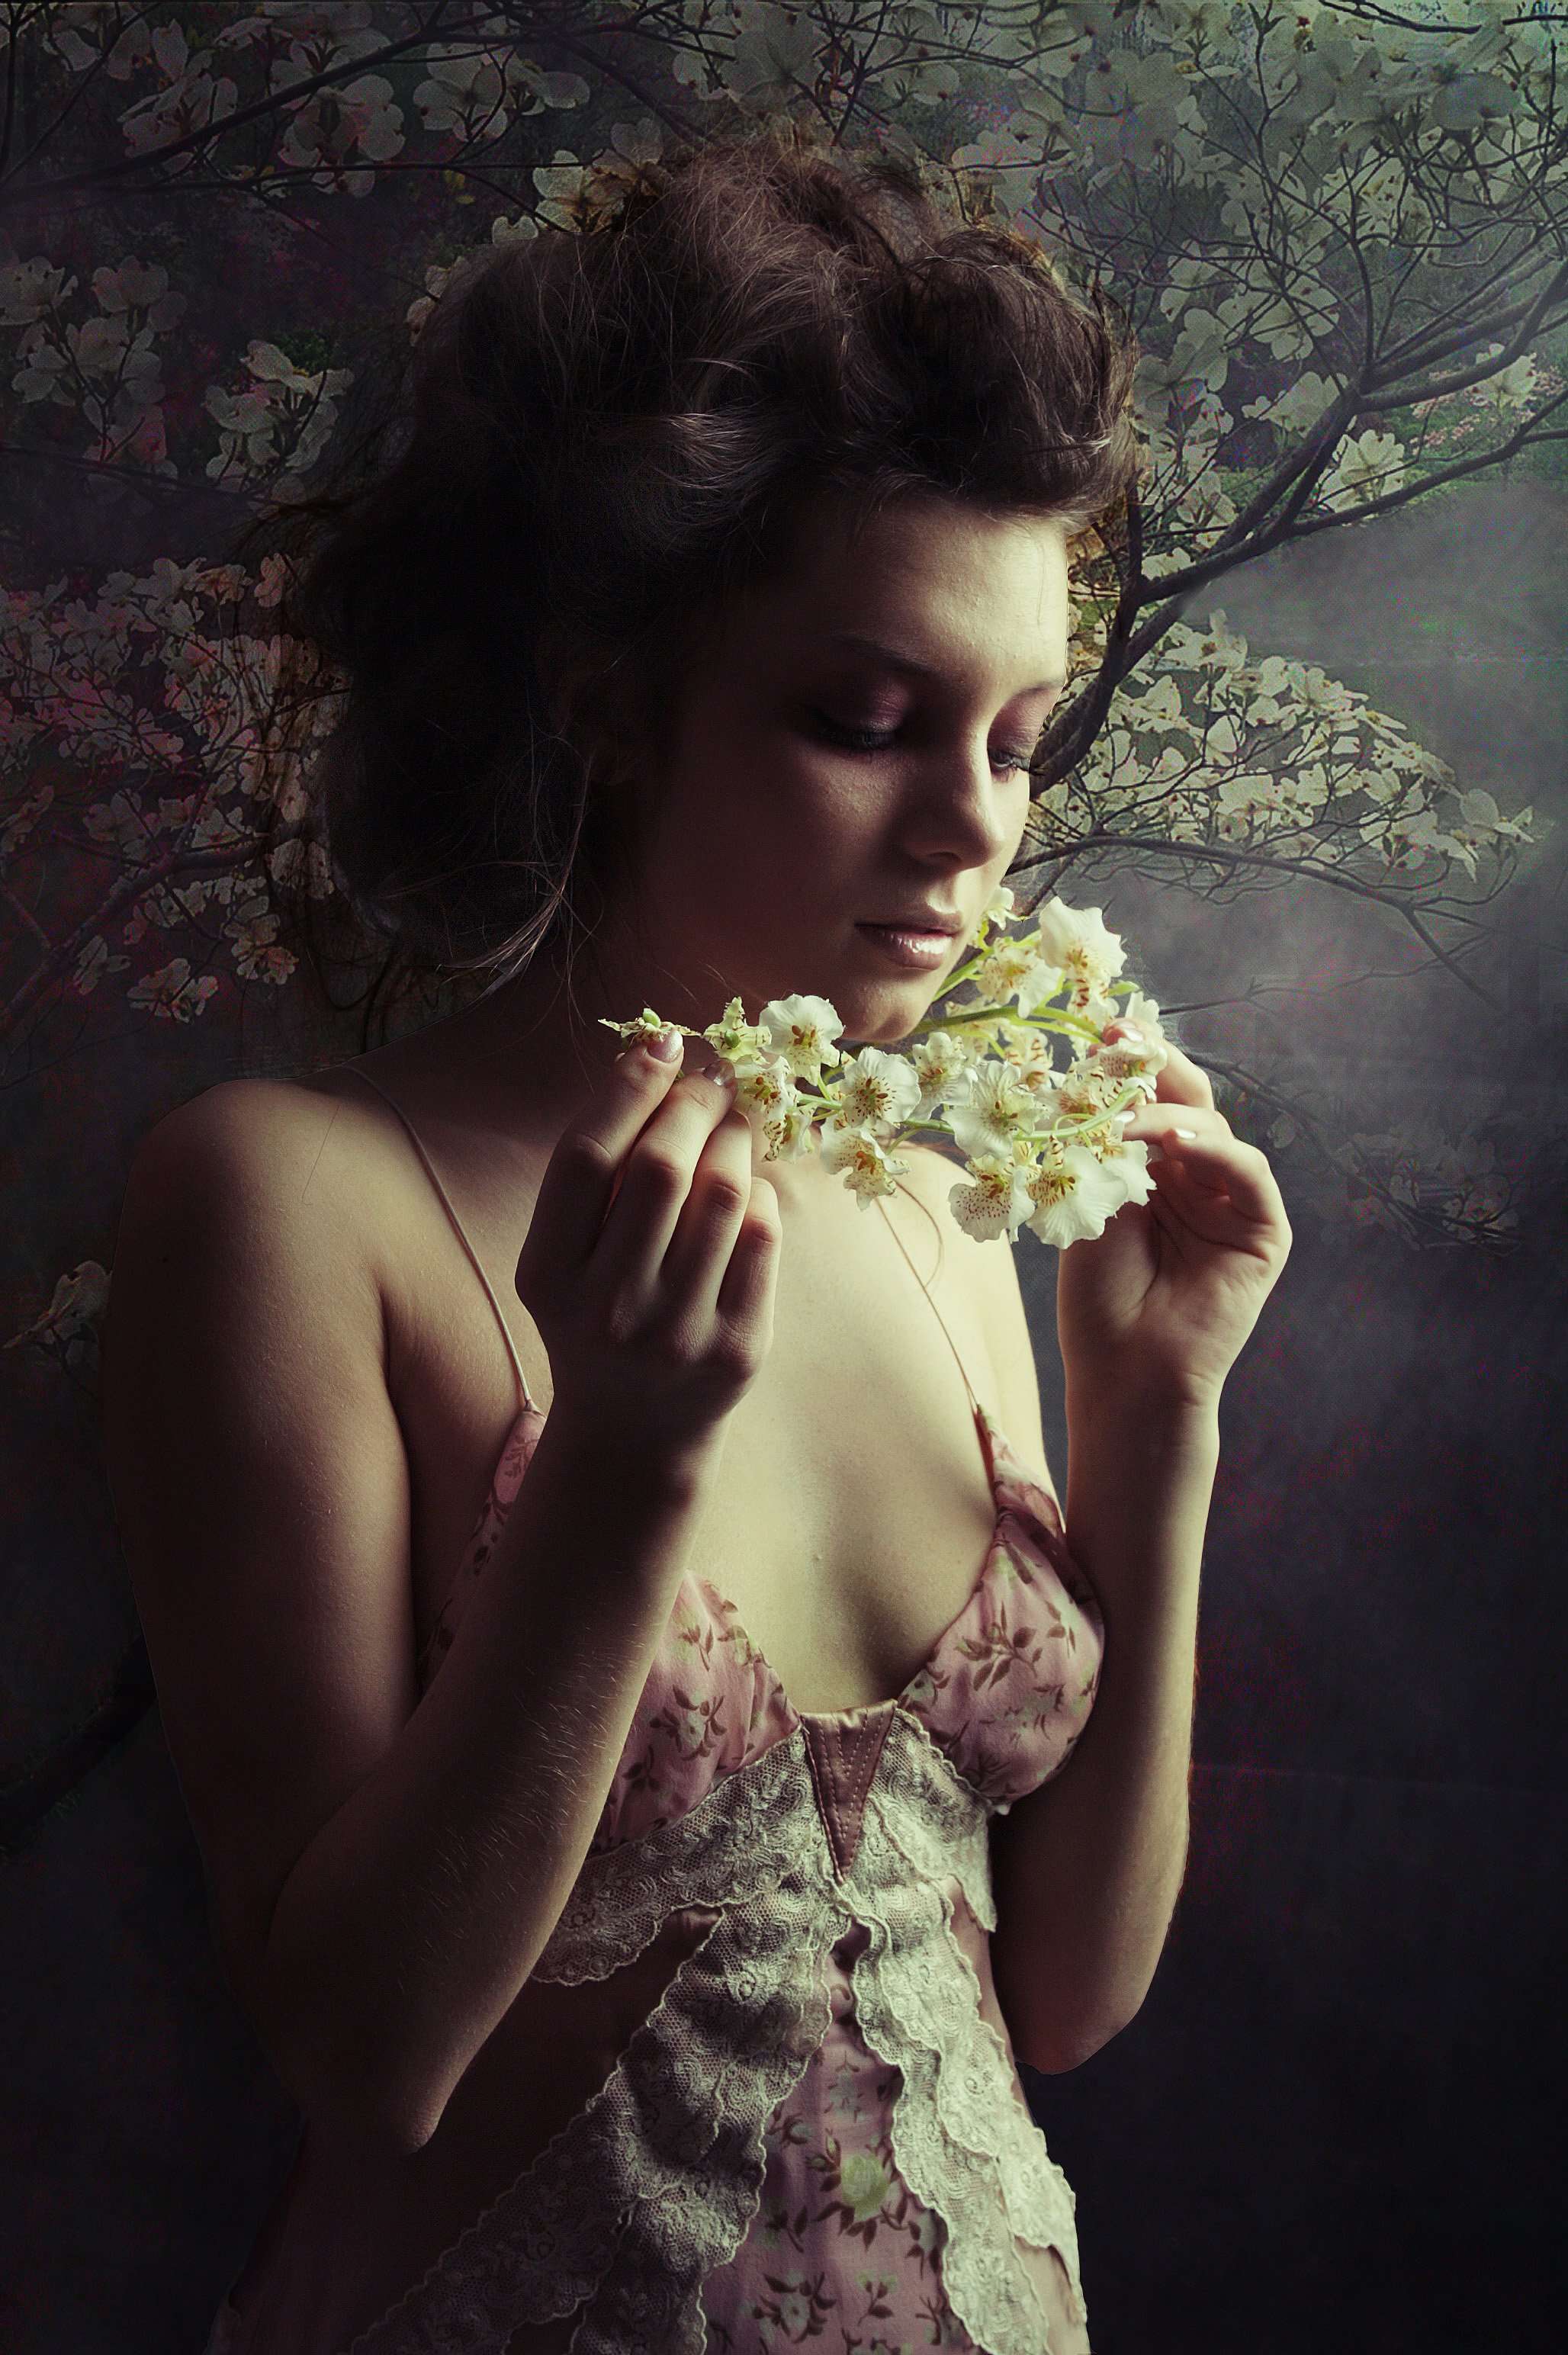 Flower spirit by NikotinAmidBoo